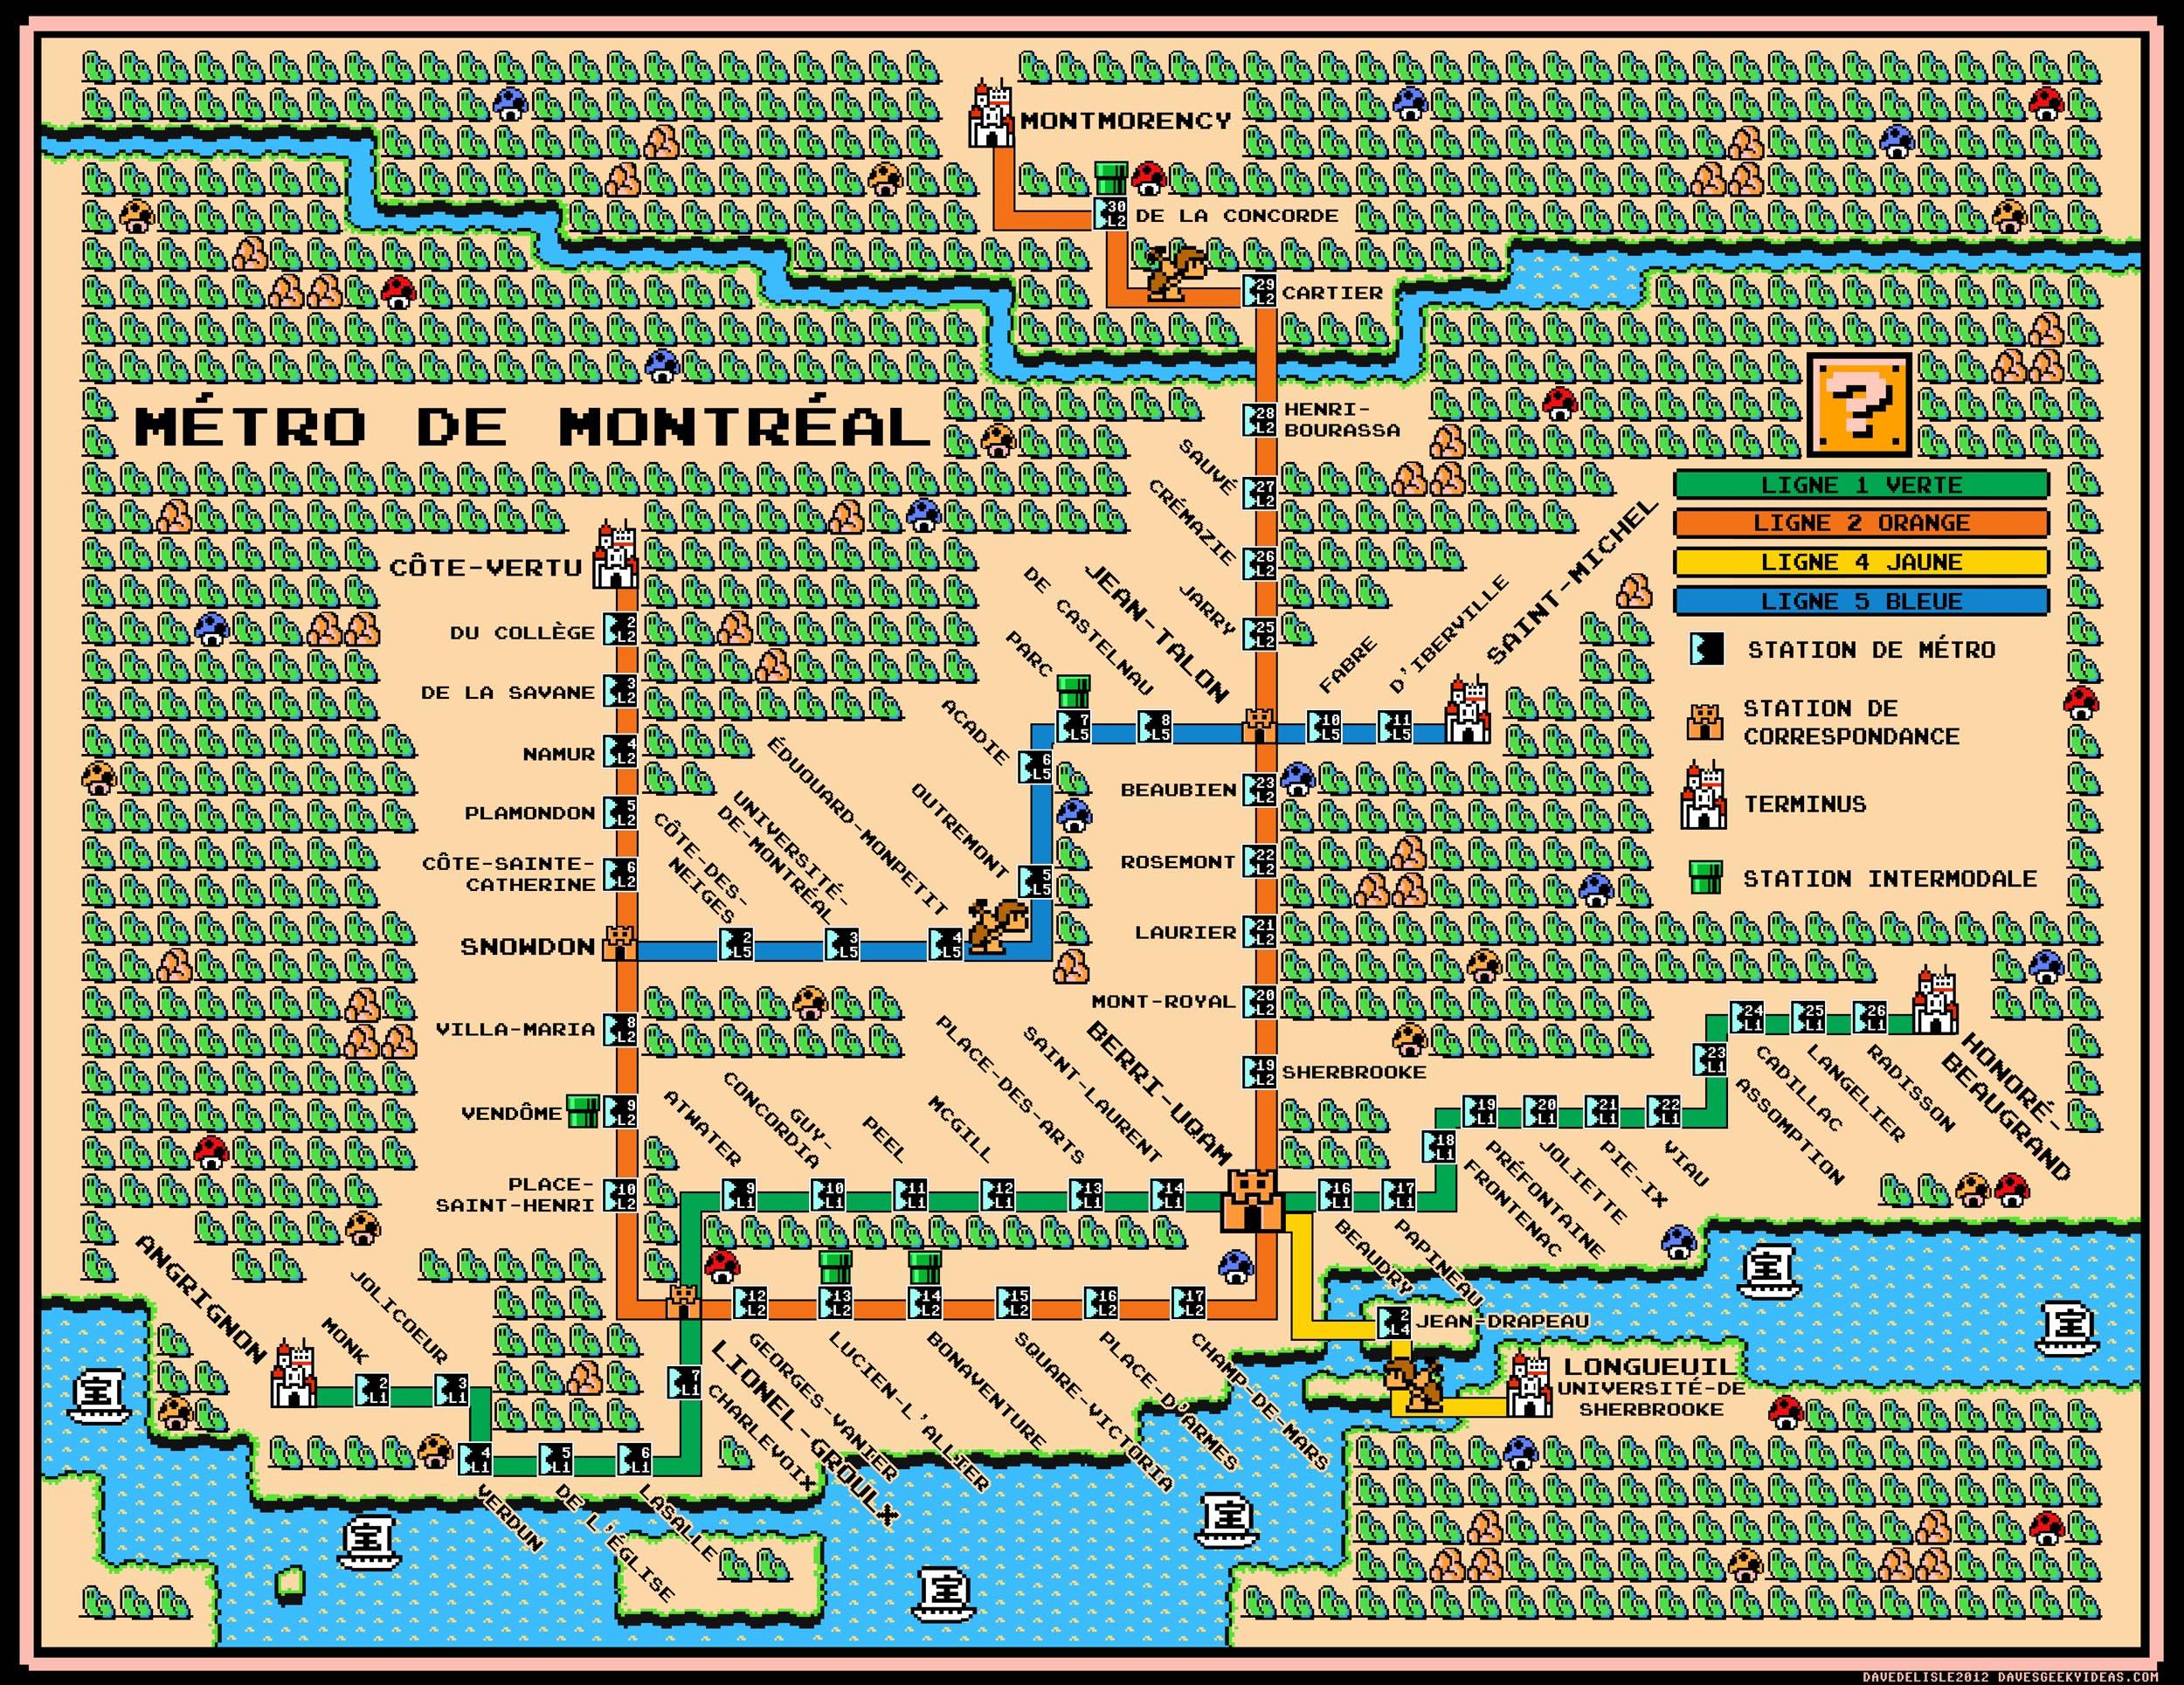 Montreal Metro Map  Super Mario  Style Daves Geeky Ideas - Washington dc map subway